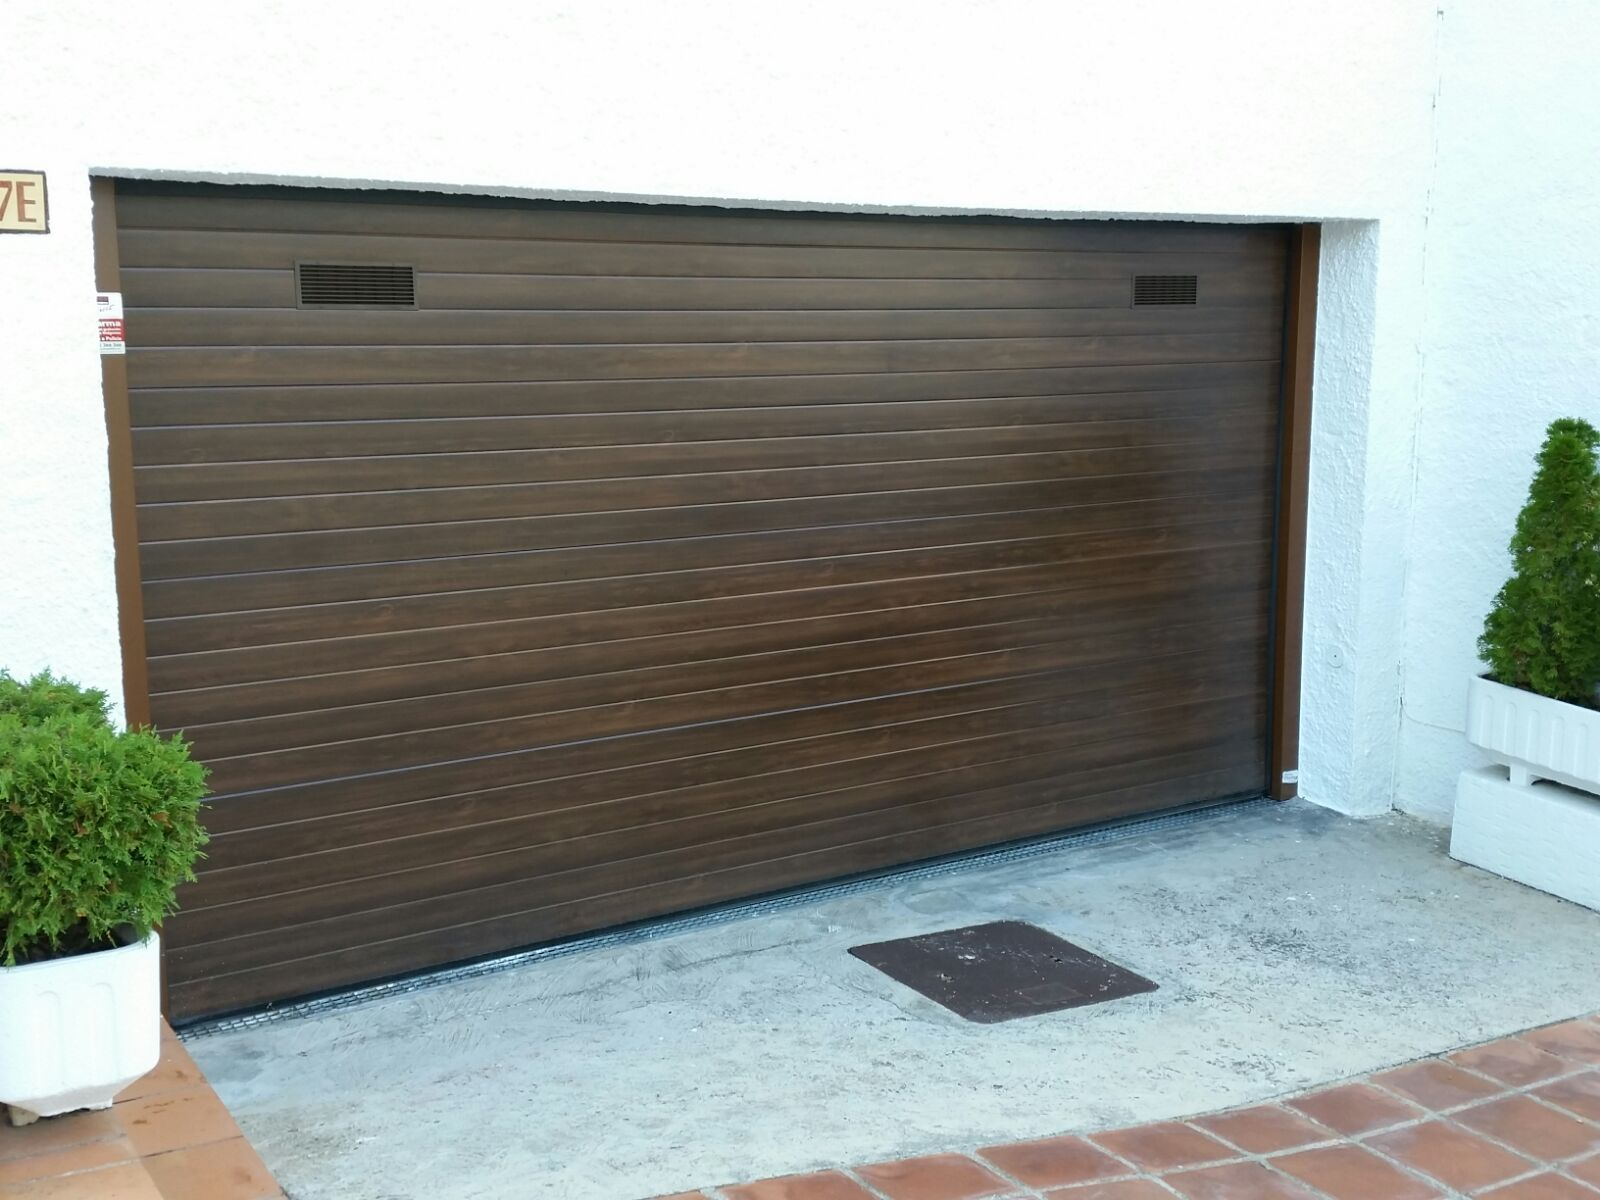 Puerta seccional de garaje en panel imitaci n madera for Puertas de garaje de madera